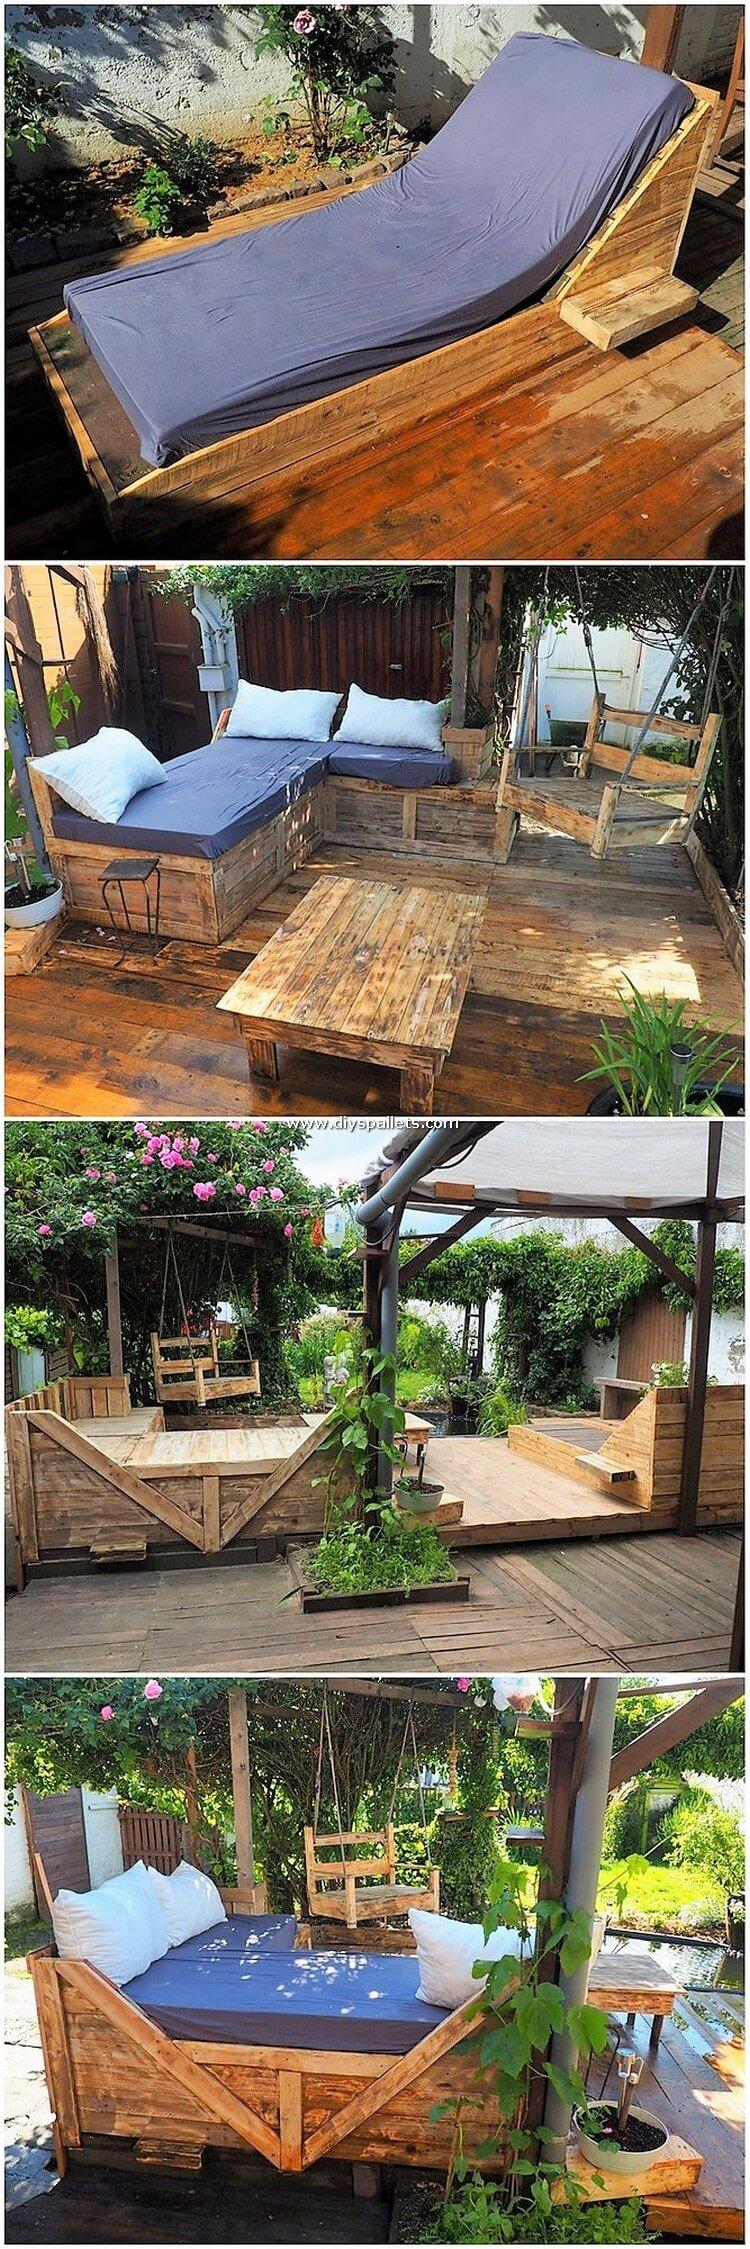 Pallet Garden Terrace with Furniture